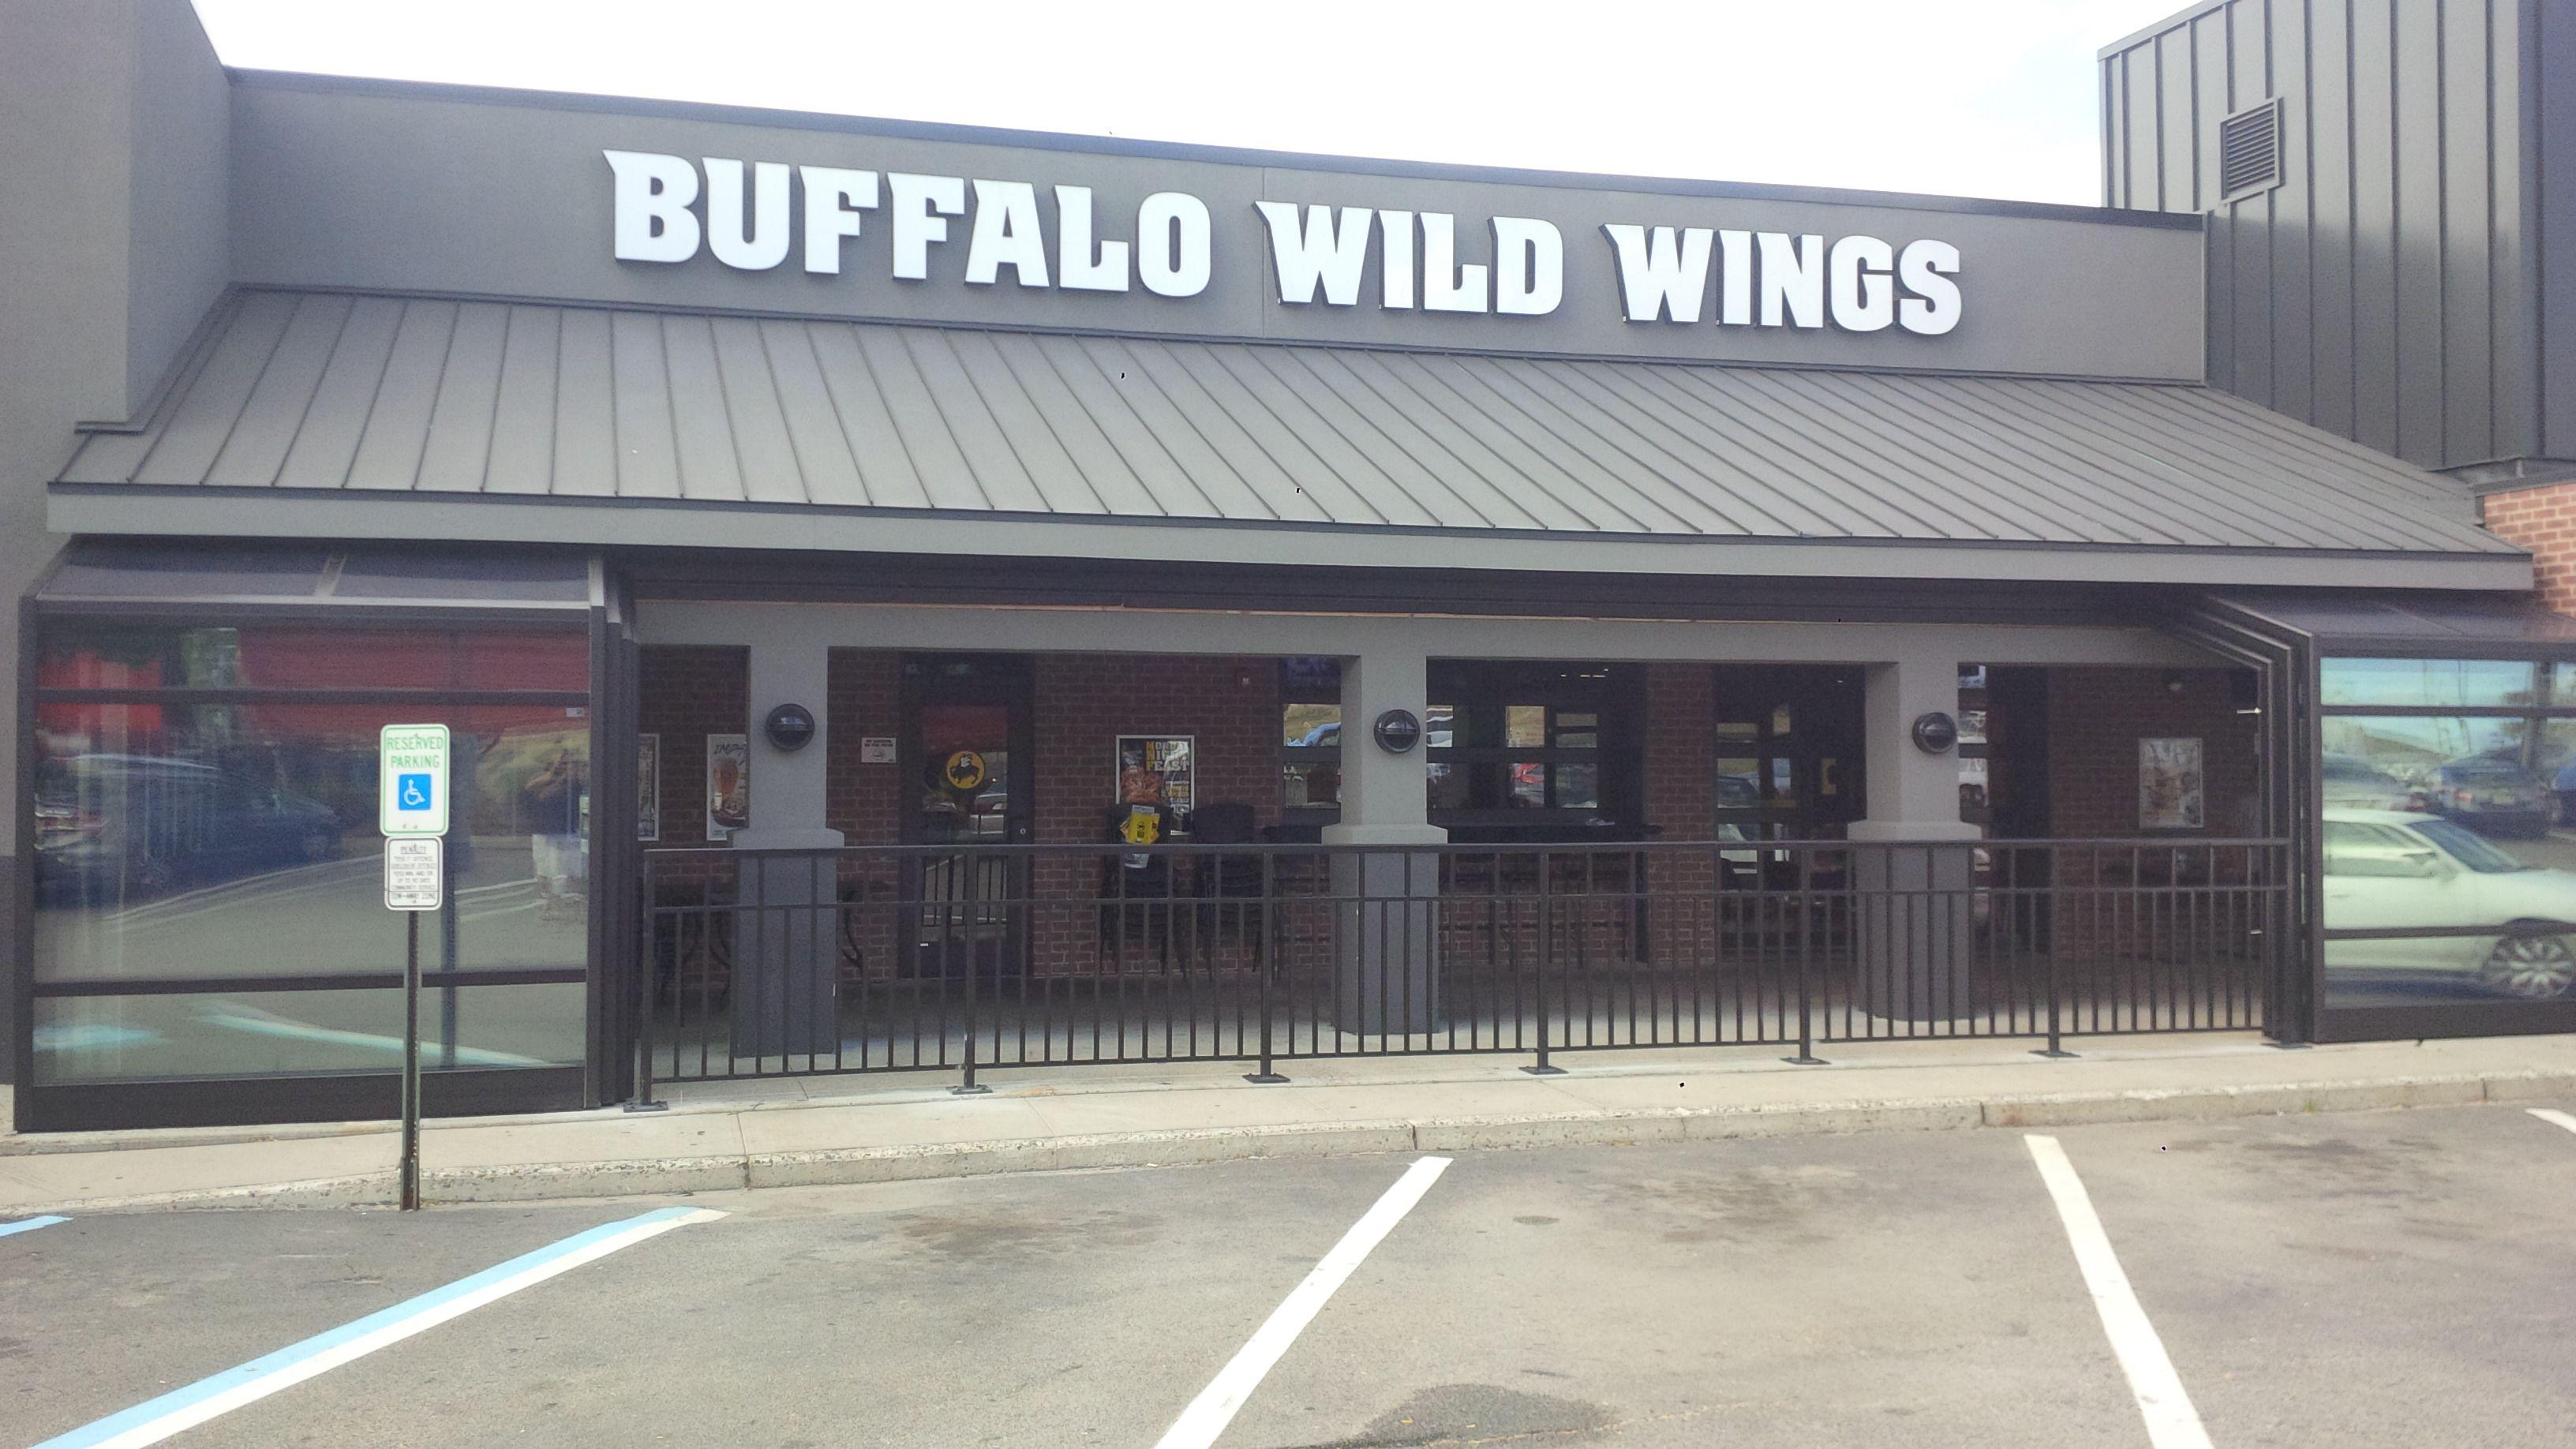 Roll A Cover S Retractable Enclosure At Buffalo Wild Wings In Woodbridge Nj Buffalo Wild Wings Buffalo Wild Wood Bridge